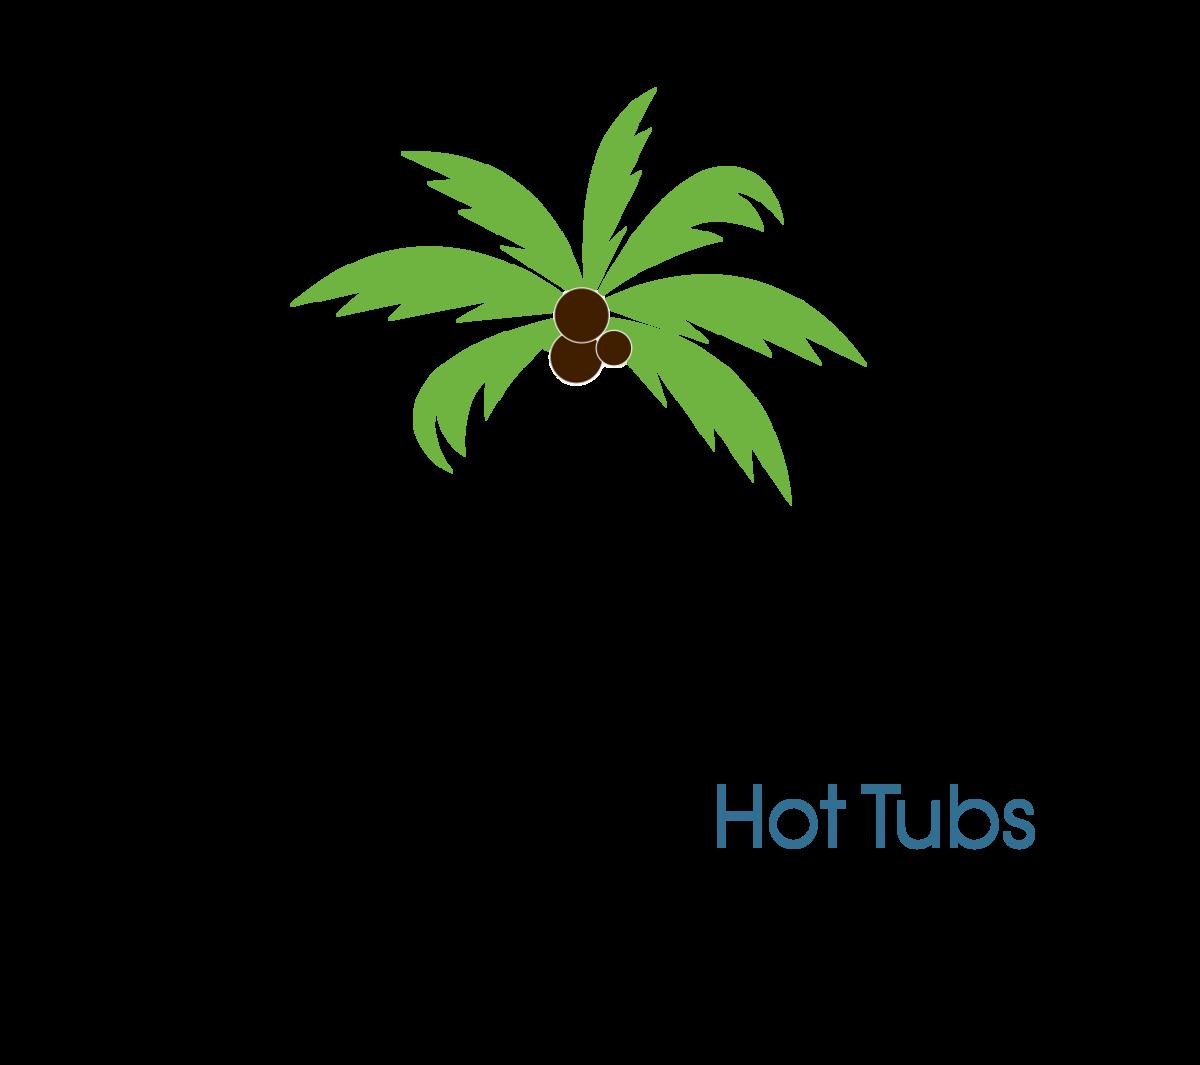 Hatana_Hot_tubs_LOGO_1200x1200